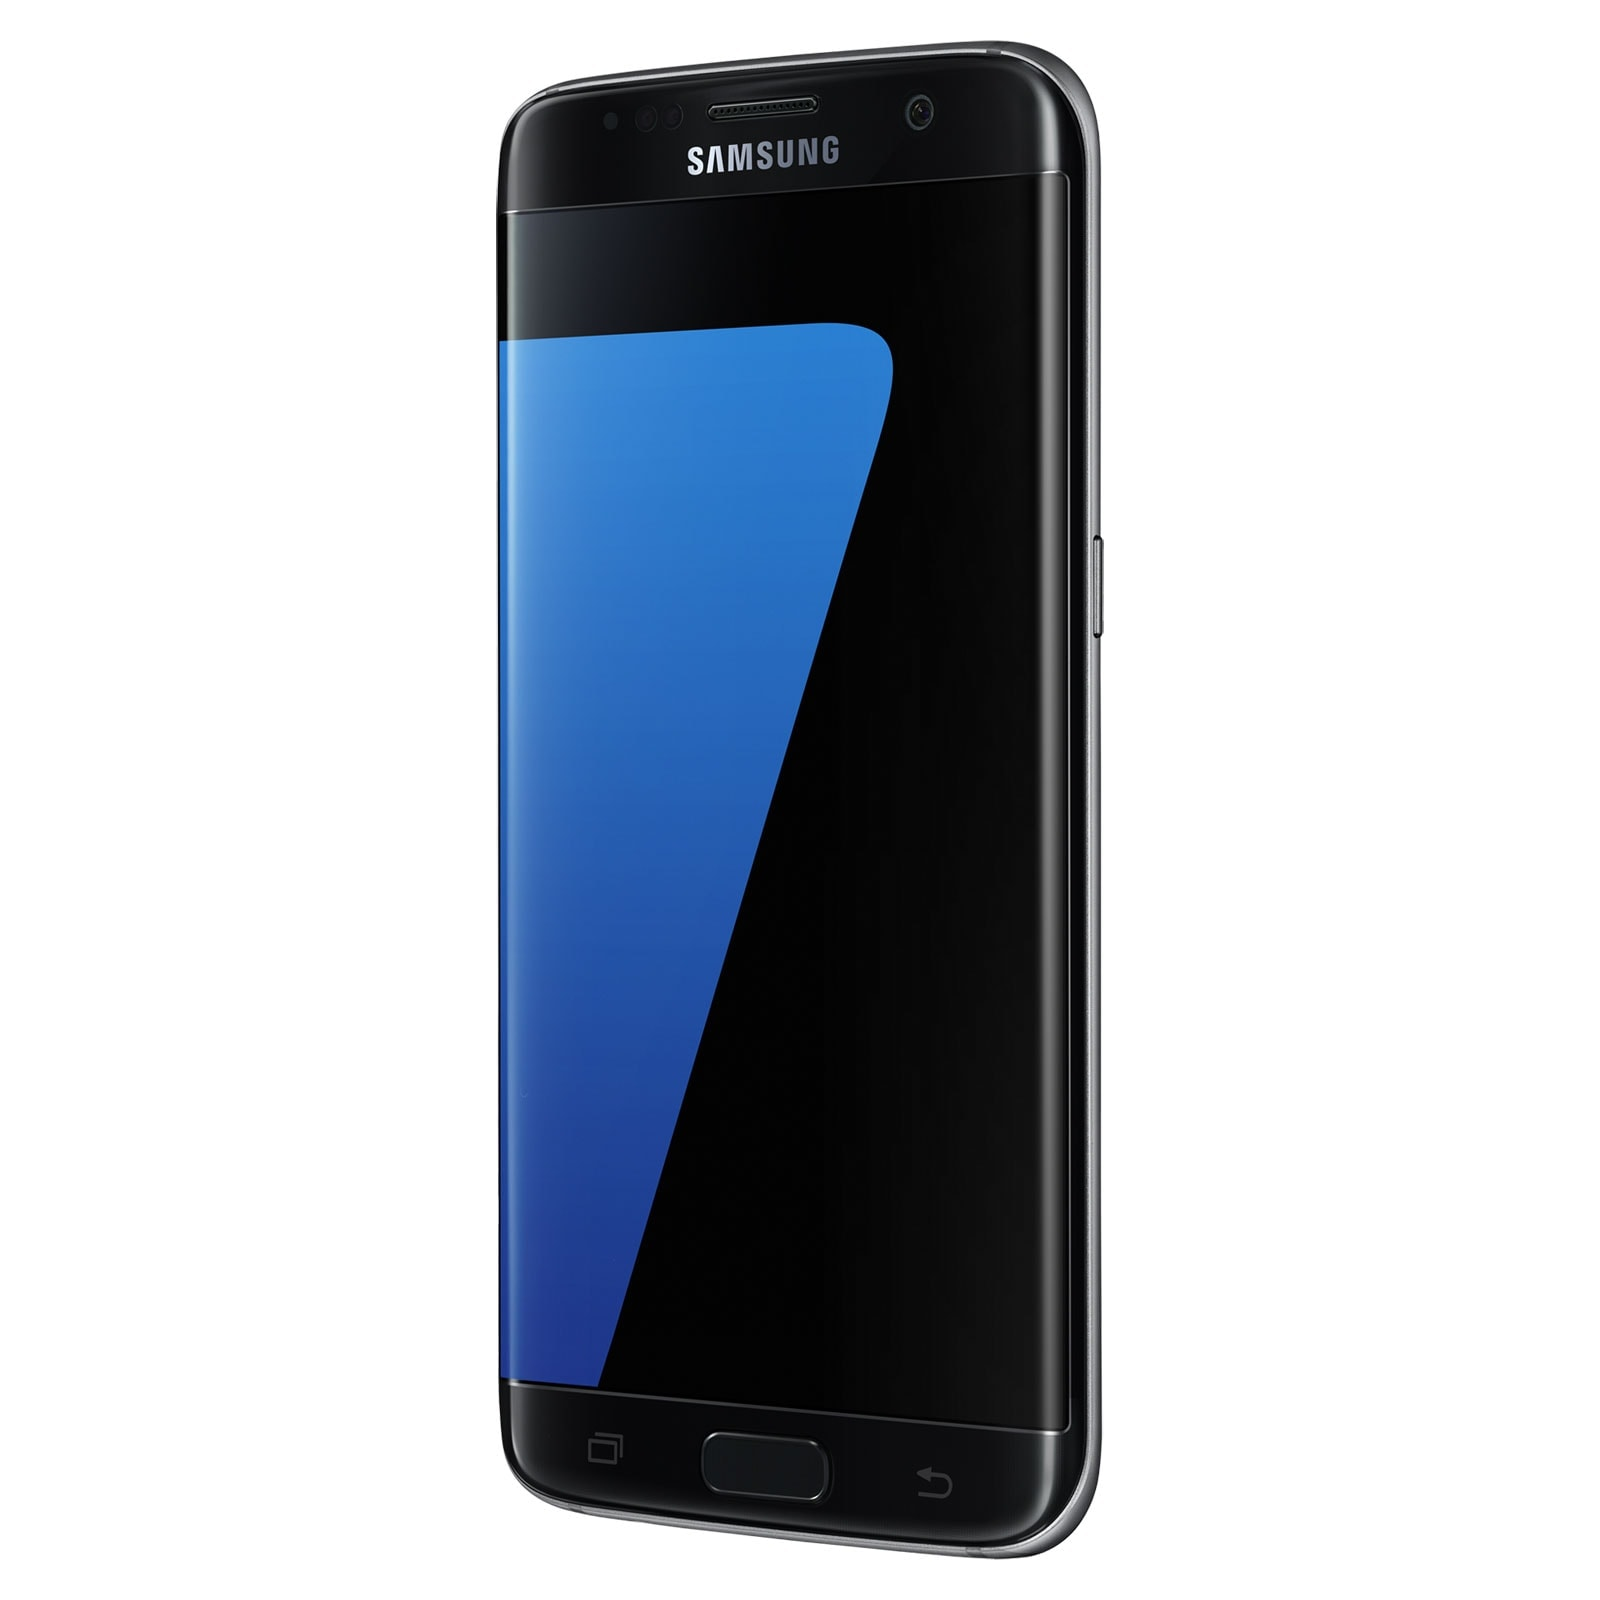 Samsung Galaxy S7 Edge 32Go G935F Black - Téléphonie Samsung - 2